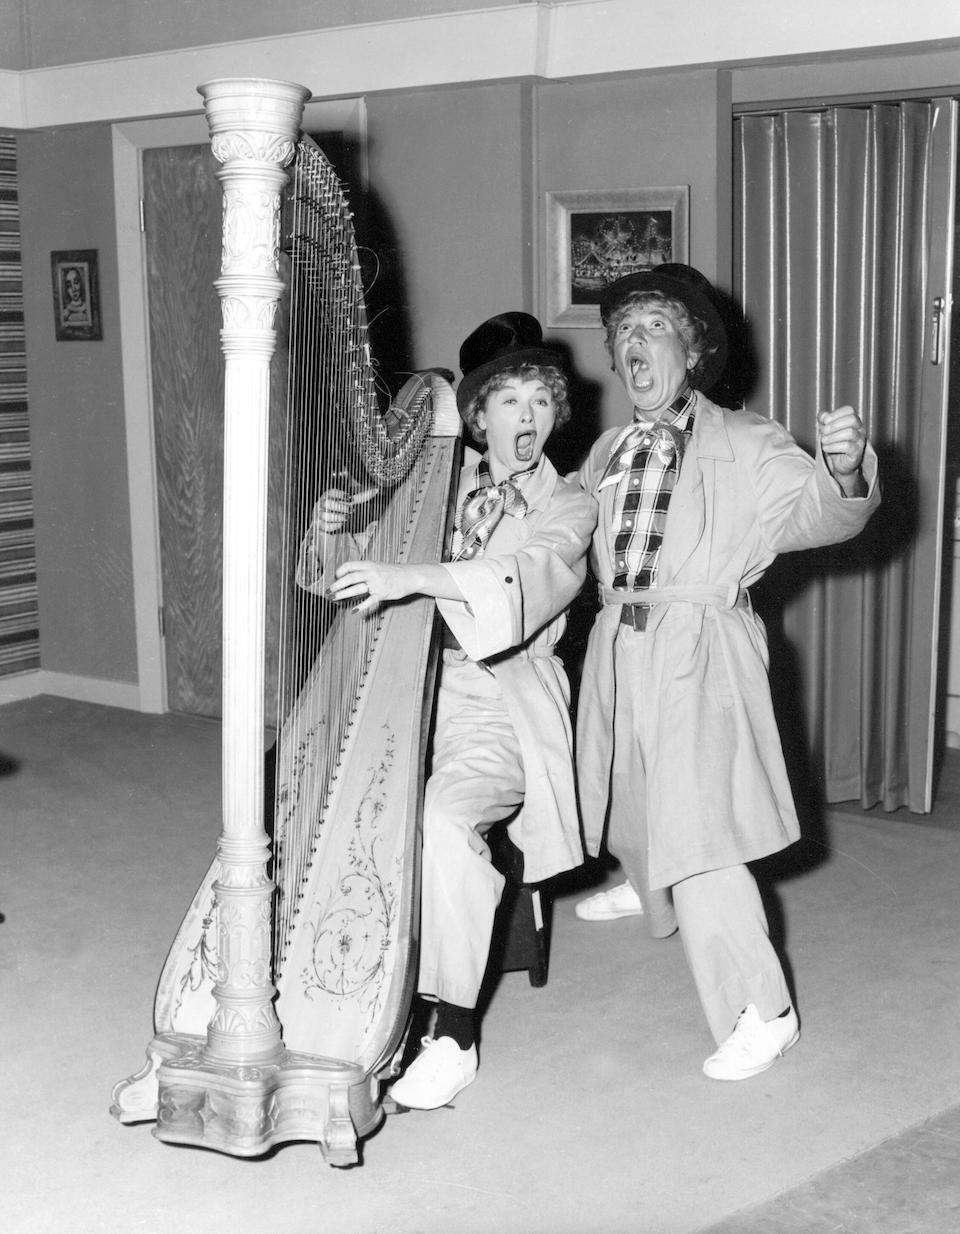 A Harpo Marx harp used on I Love Lucy